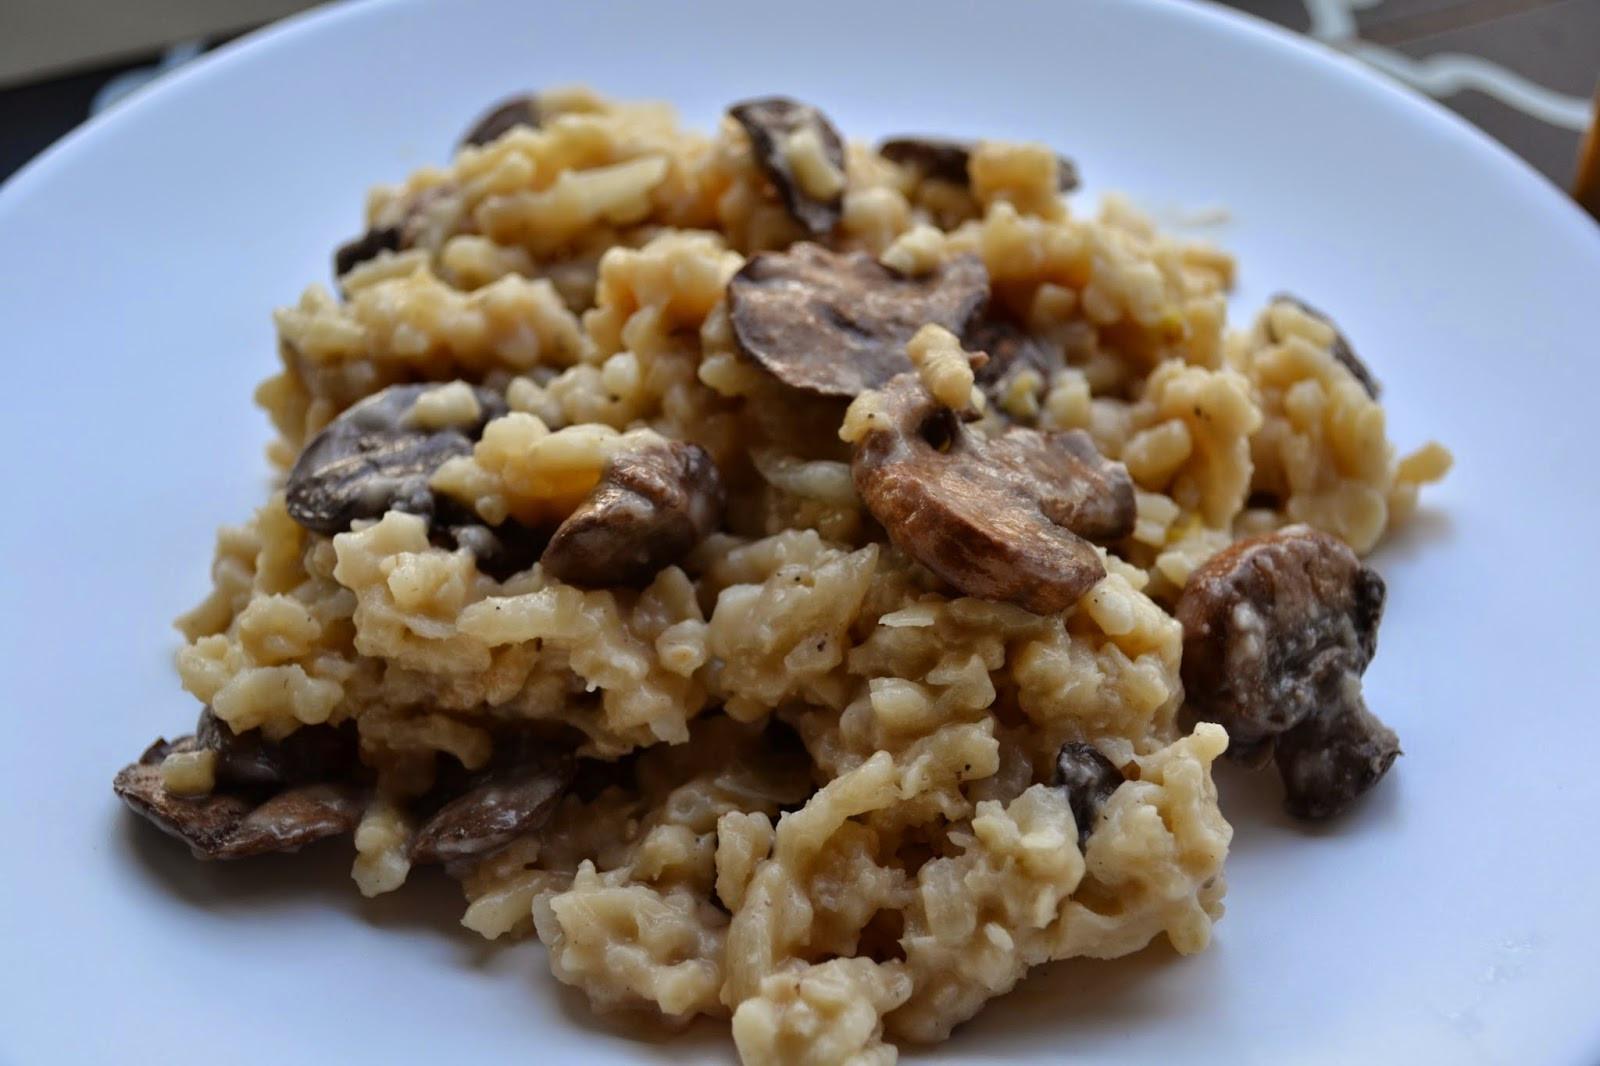 Gourmet Mushroom Risotto  Gourmet Mushroom Risotto